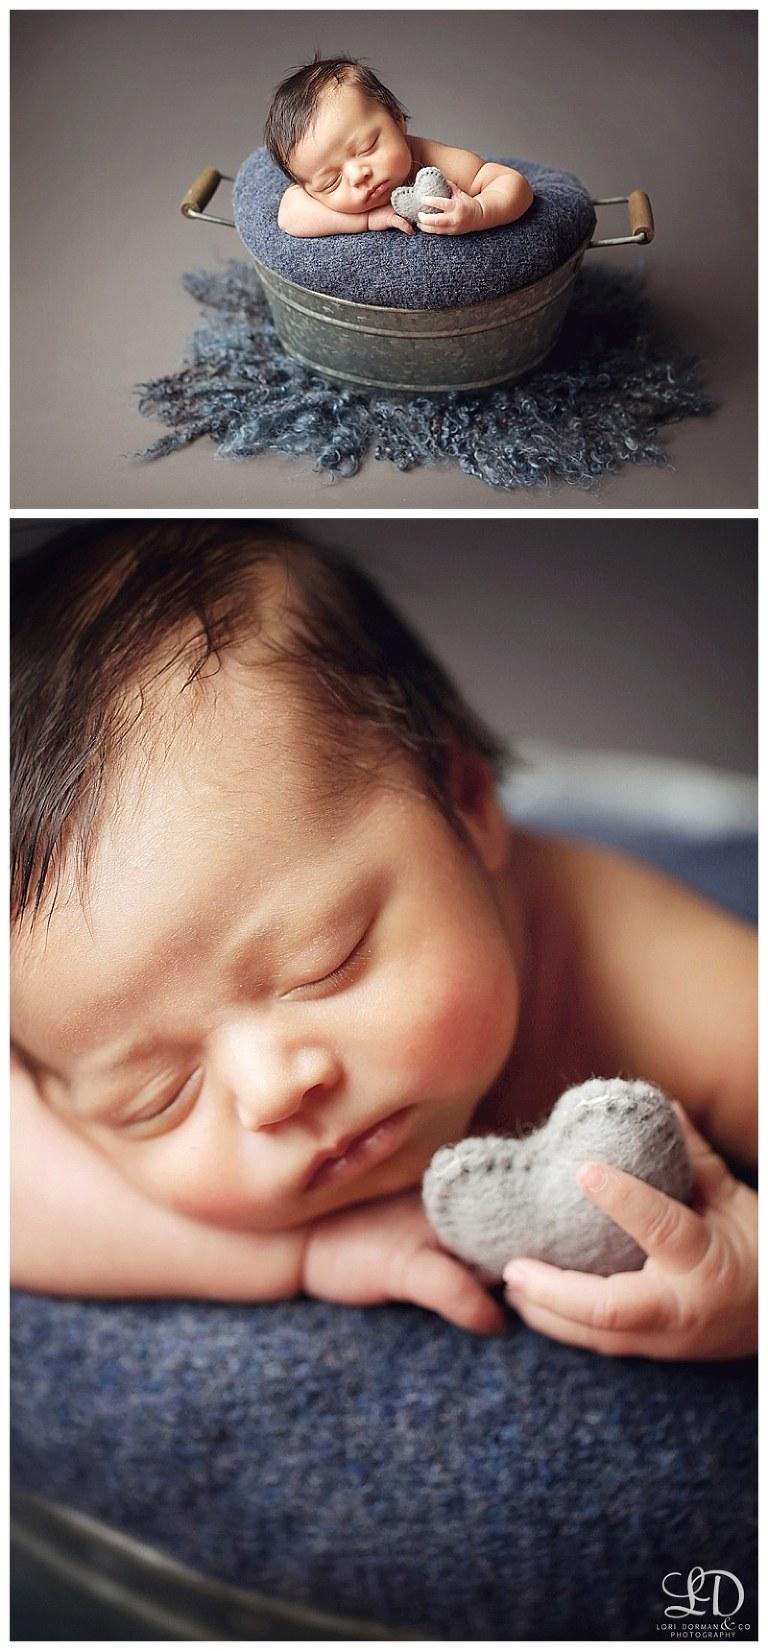 sweet maternity photoshoot-lori dorman photography-maternity boudoir-professional photographer_2499.jpg